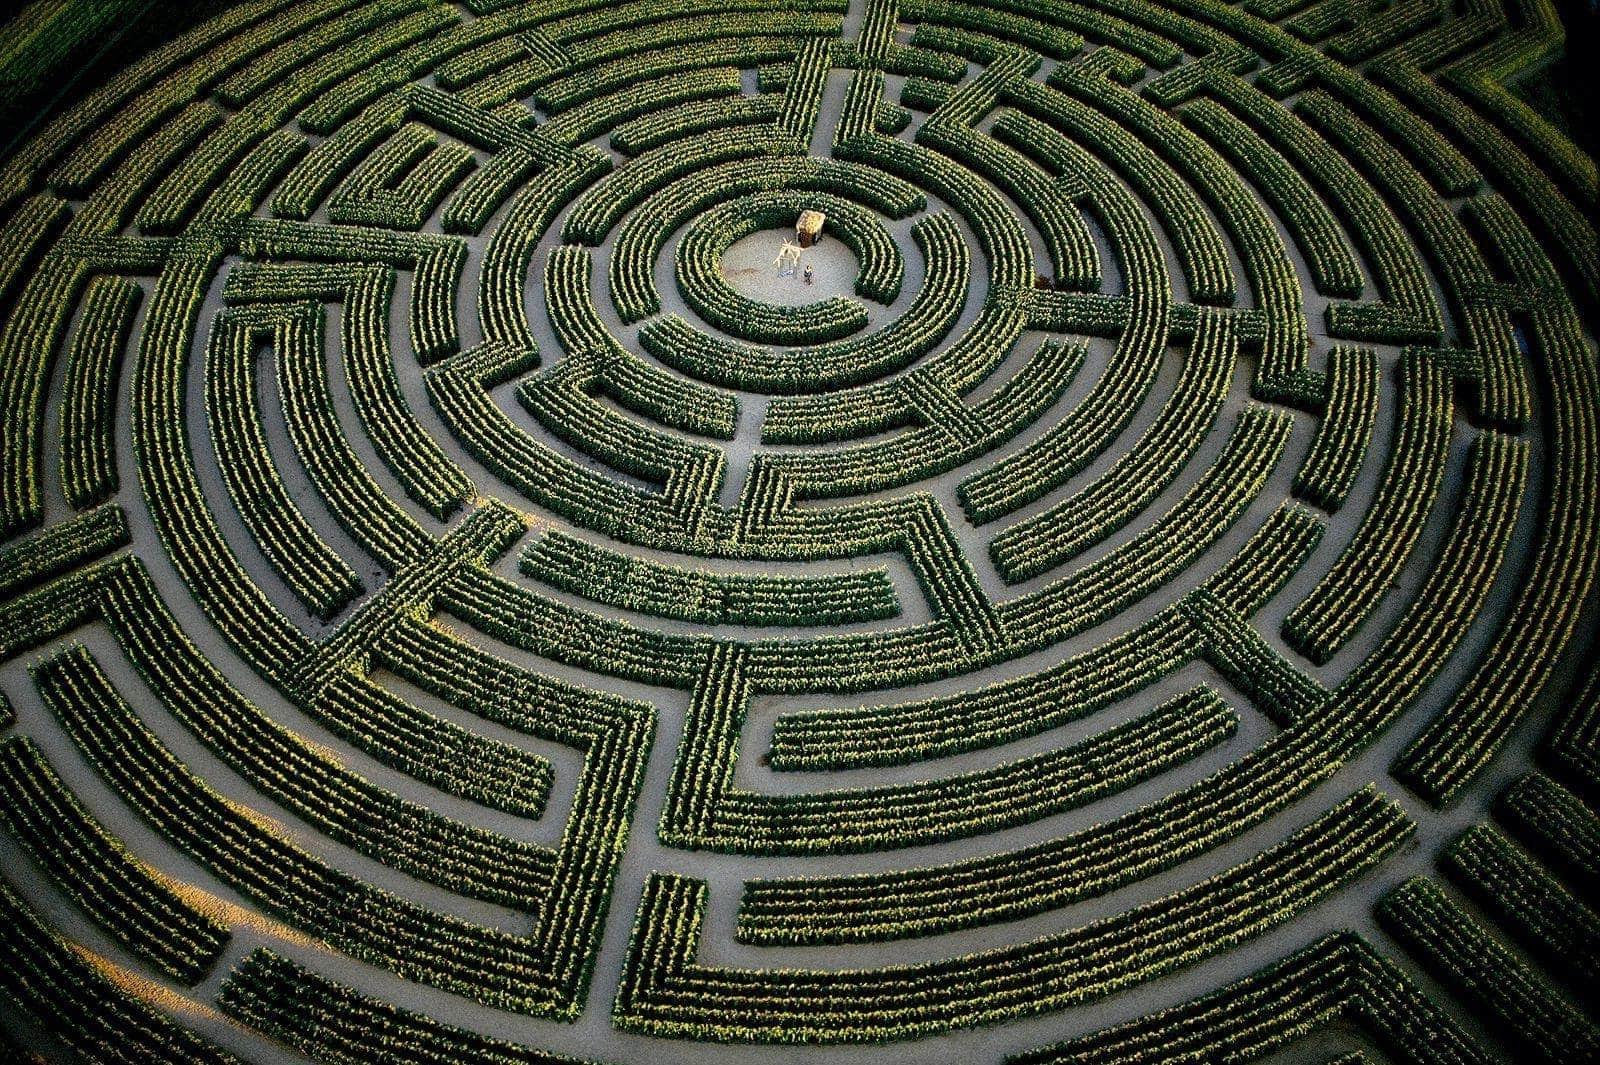 labyrinth dream meaning, dream about labyrinth, labyrinth dream interpretation, seeing in a dream labyrinth